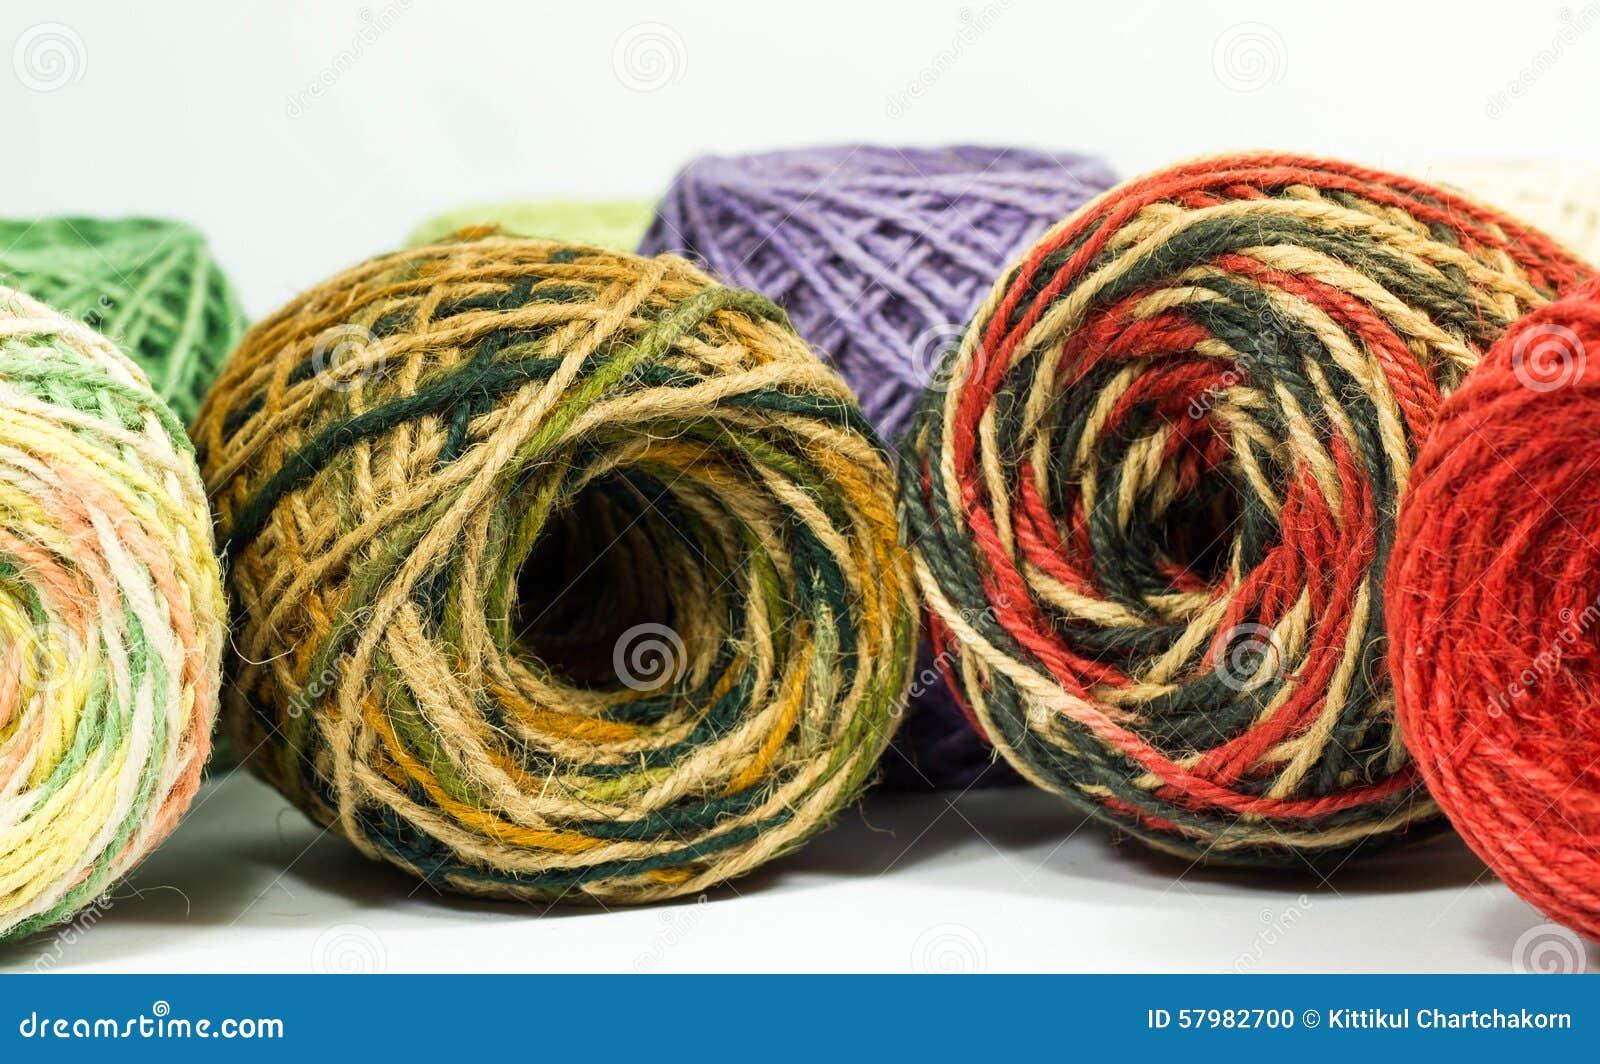 Hemp Rope Texture For Handicraft Stock Photo Image Of Yarn Concept 57982700